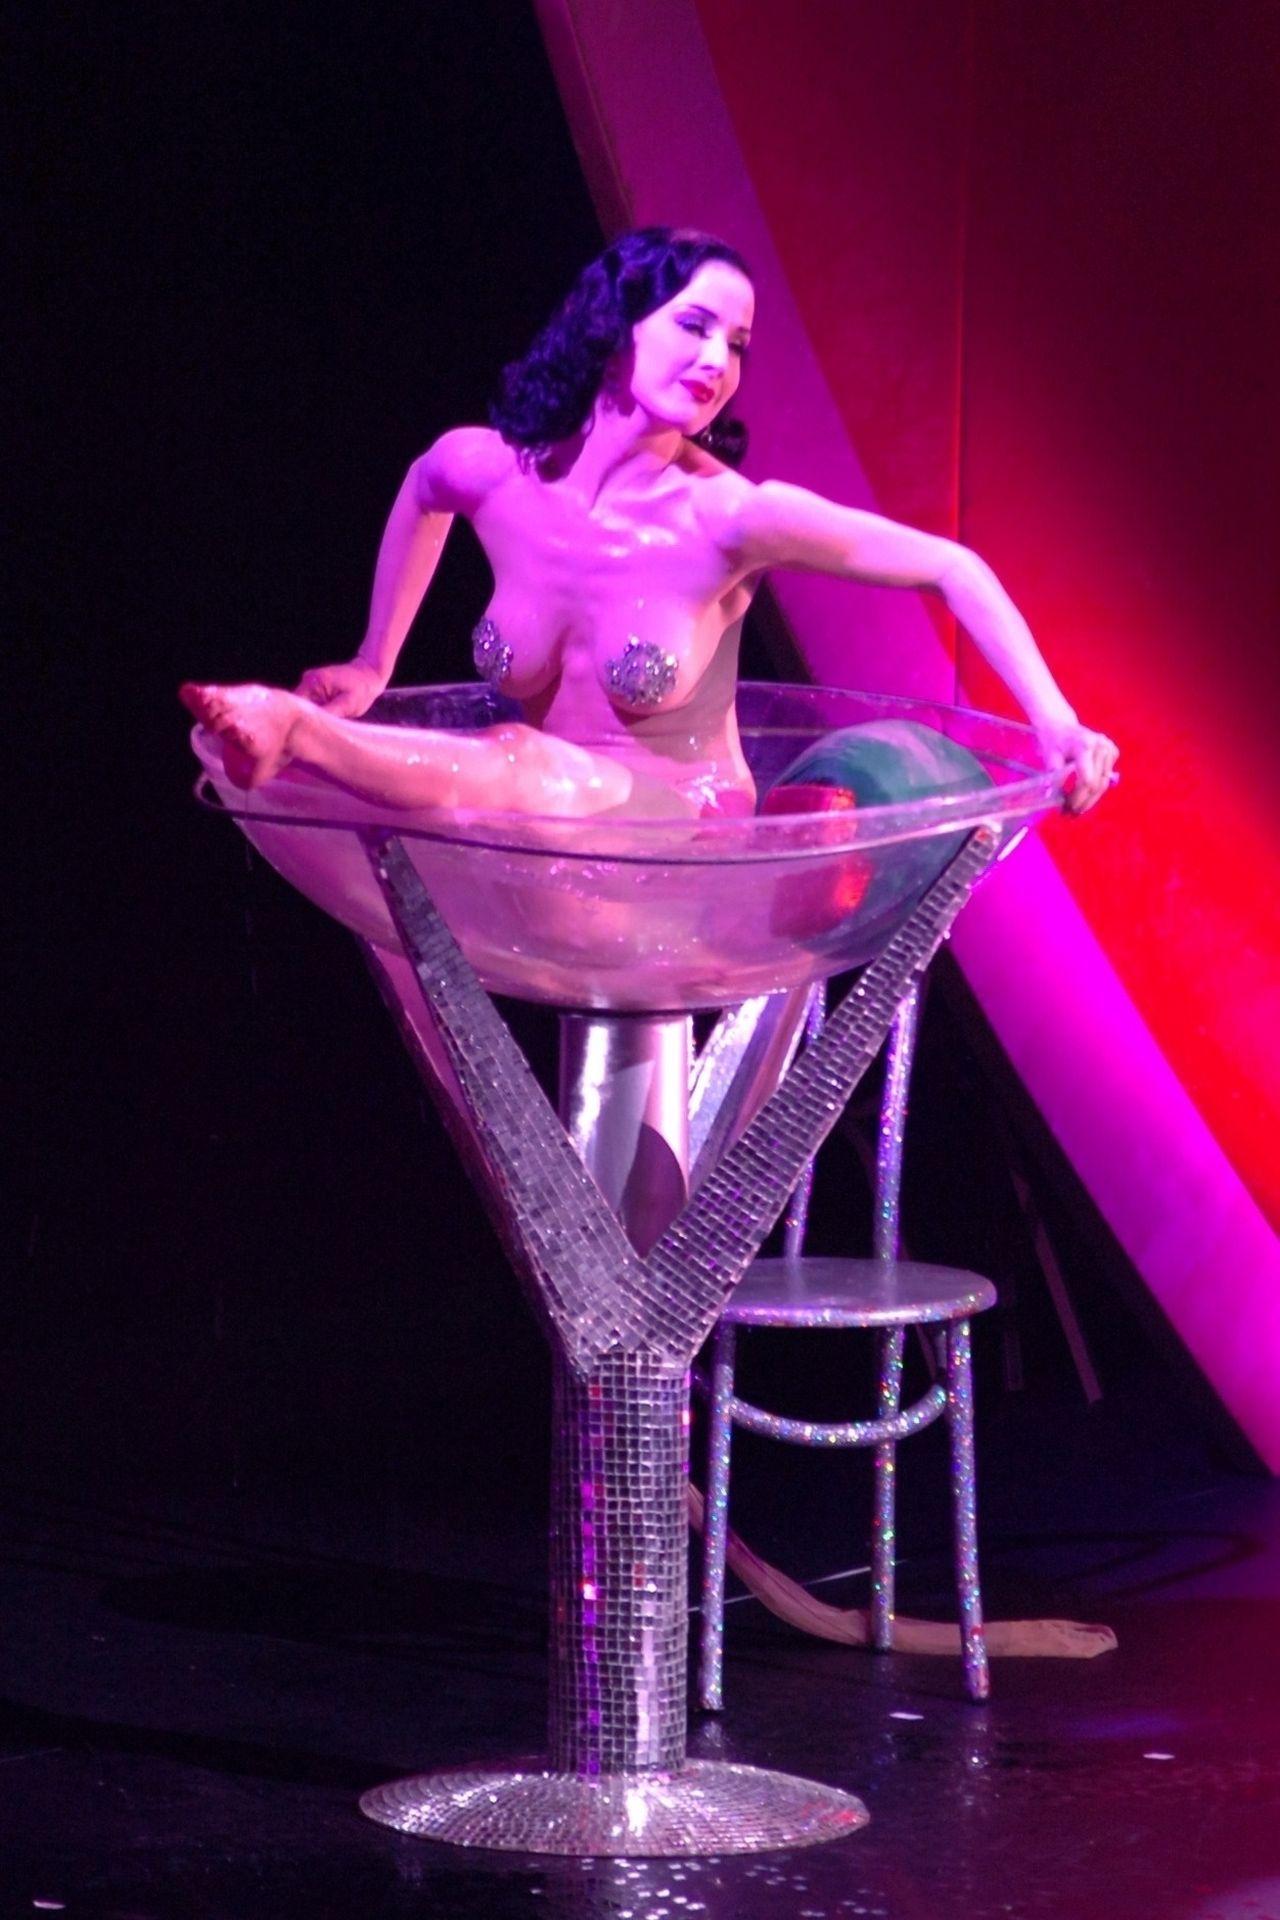 Dita Von Teese Performs At Erotica 06 In London 0037